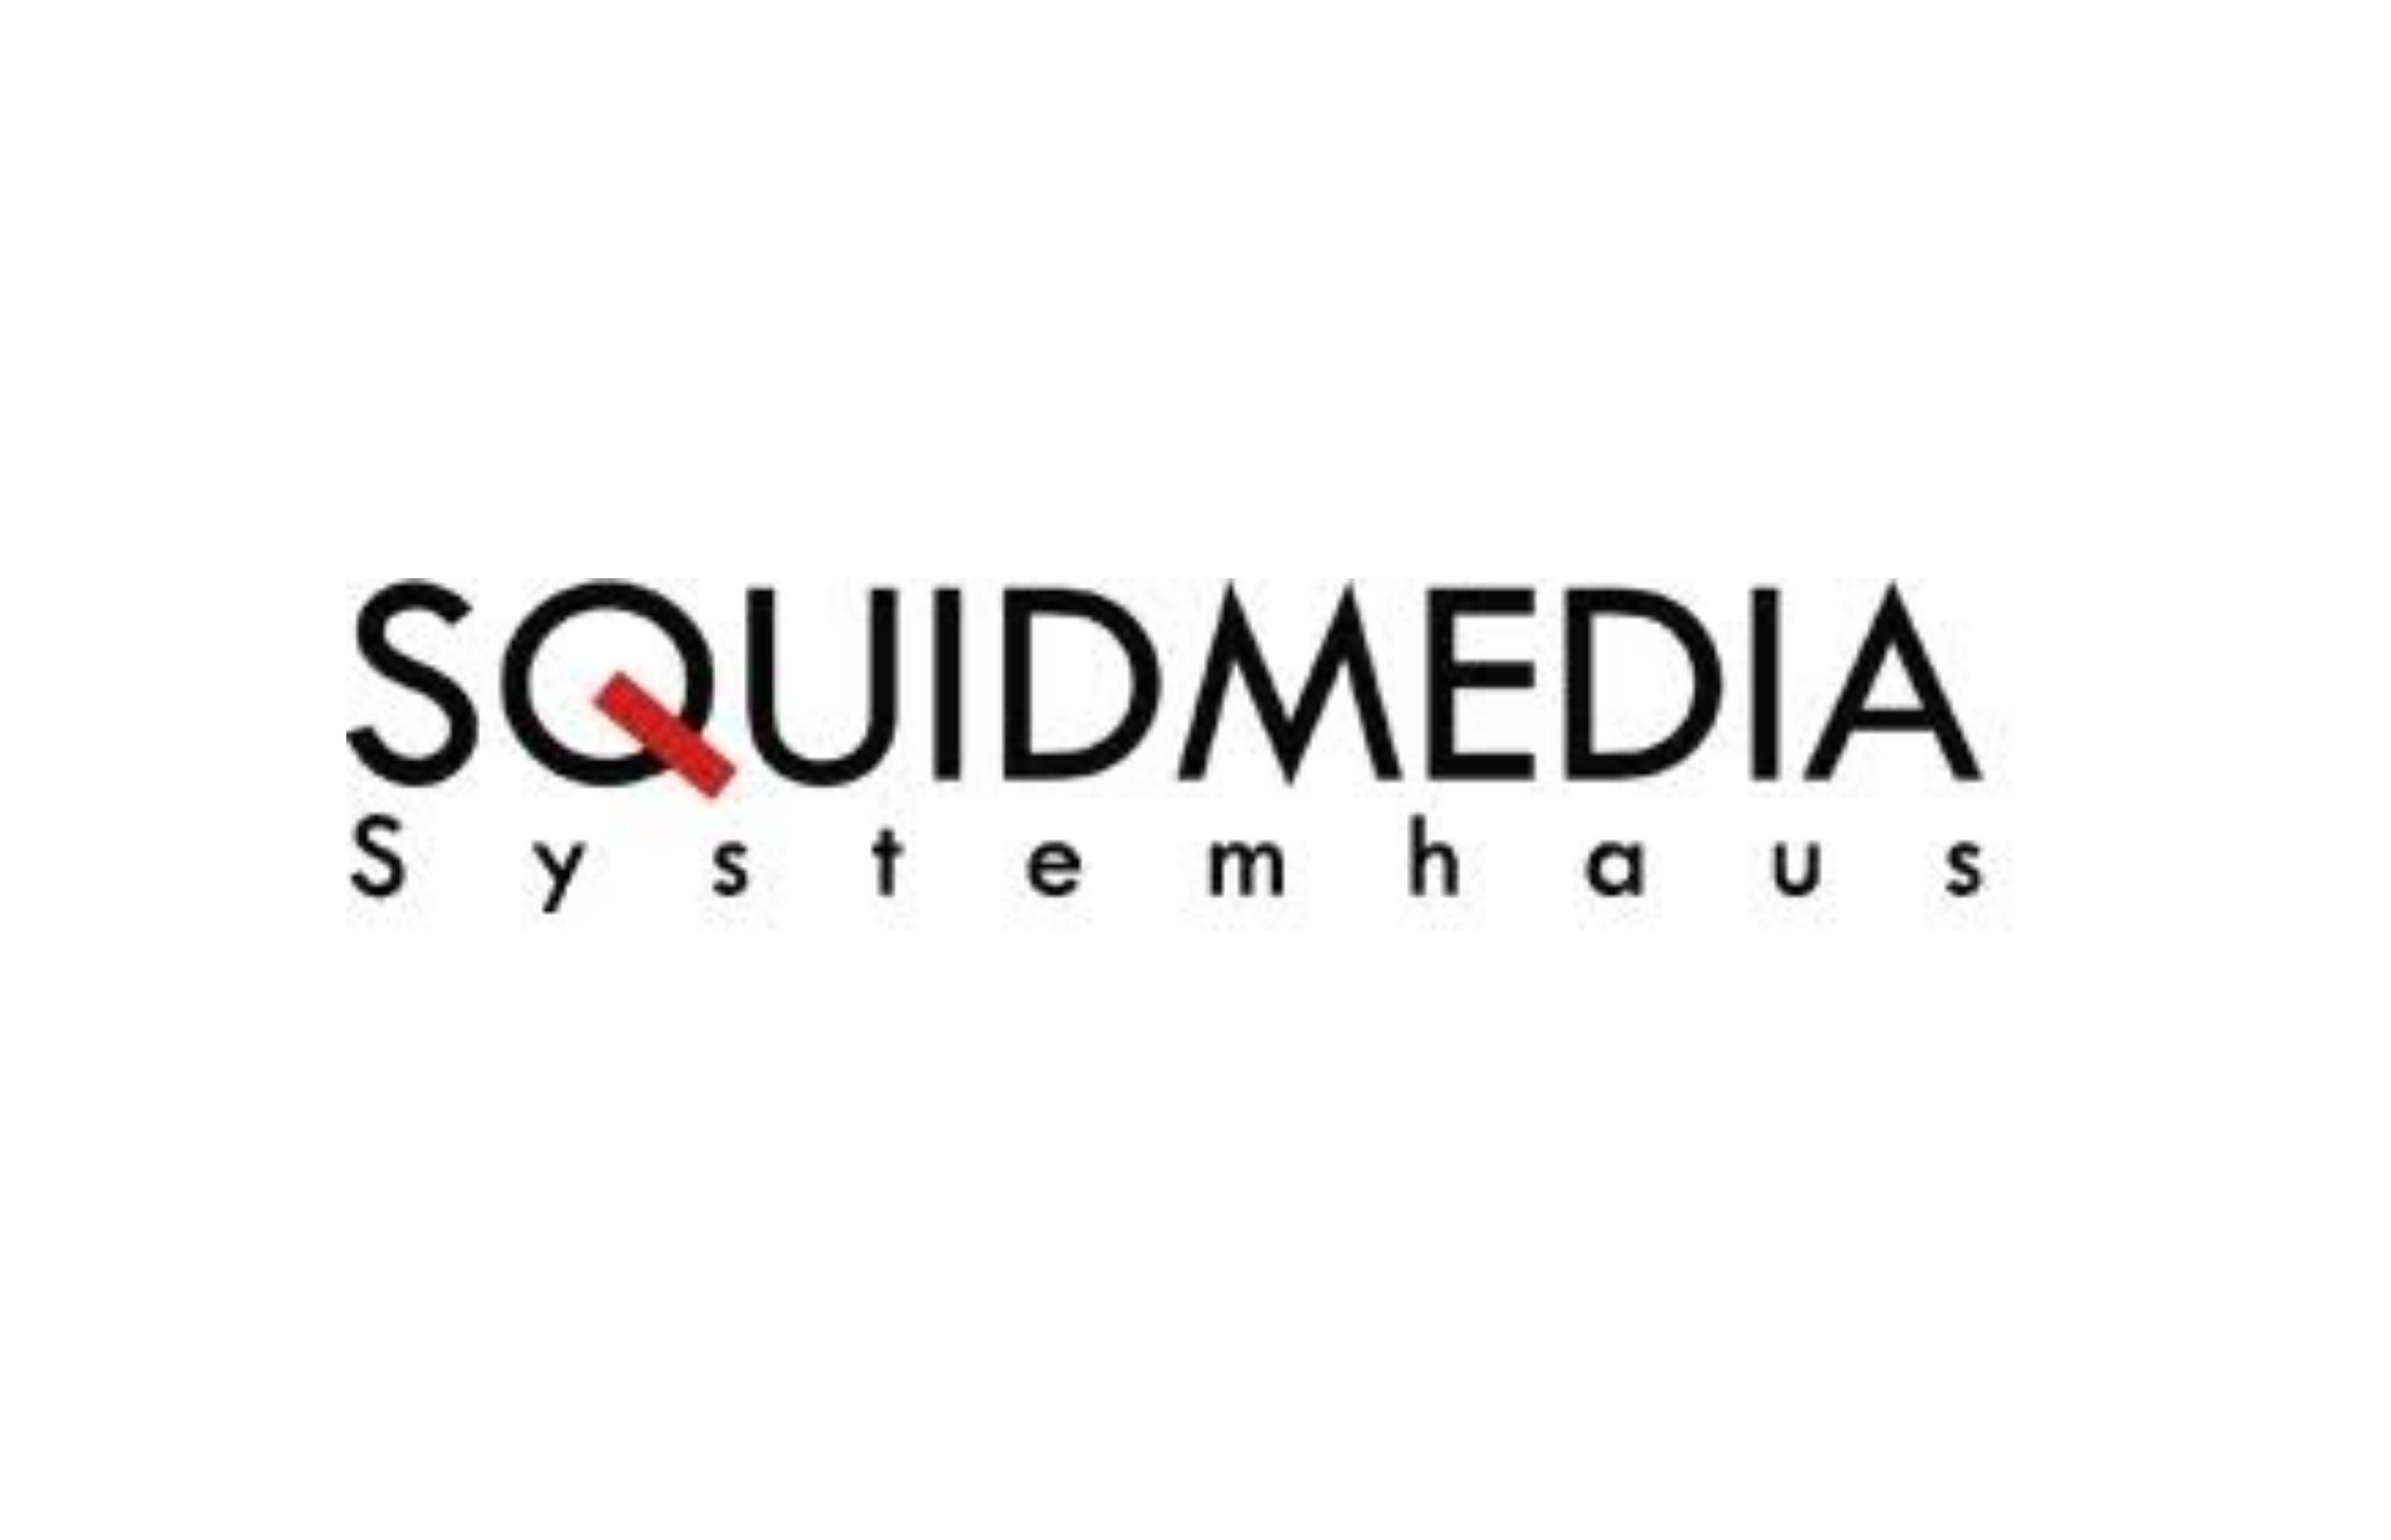 Squidmedia Systemhaus e.K